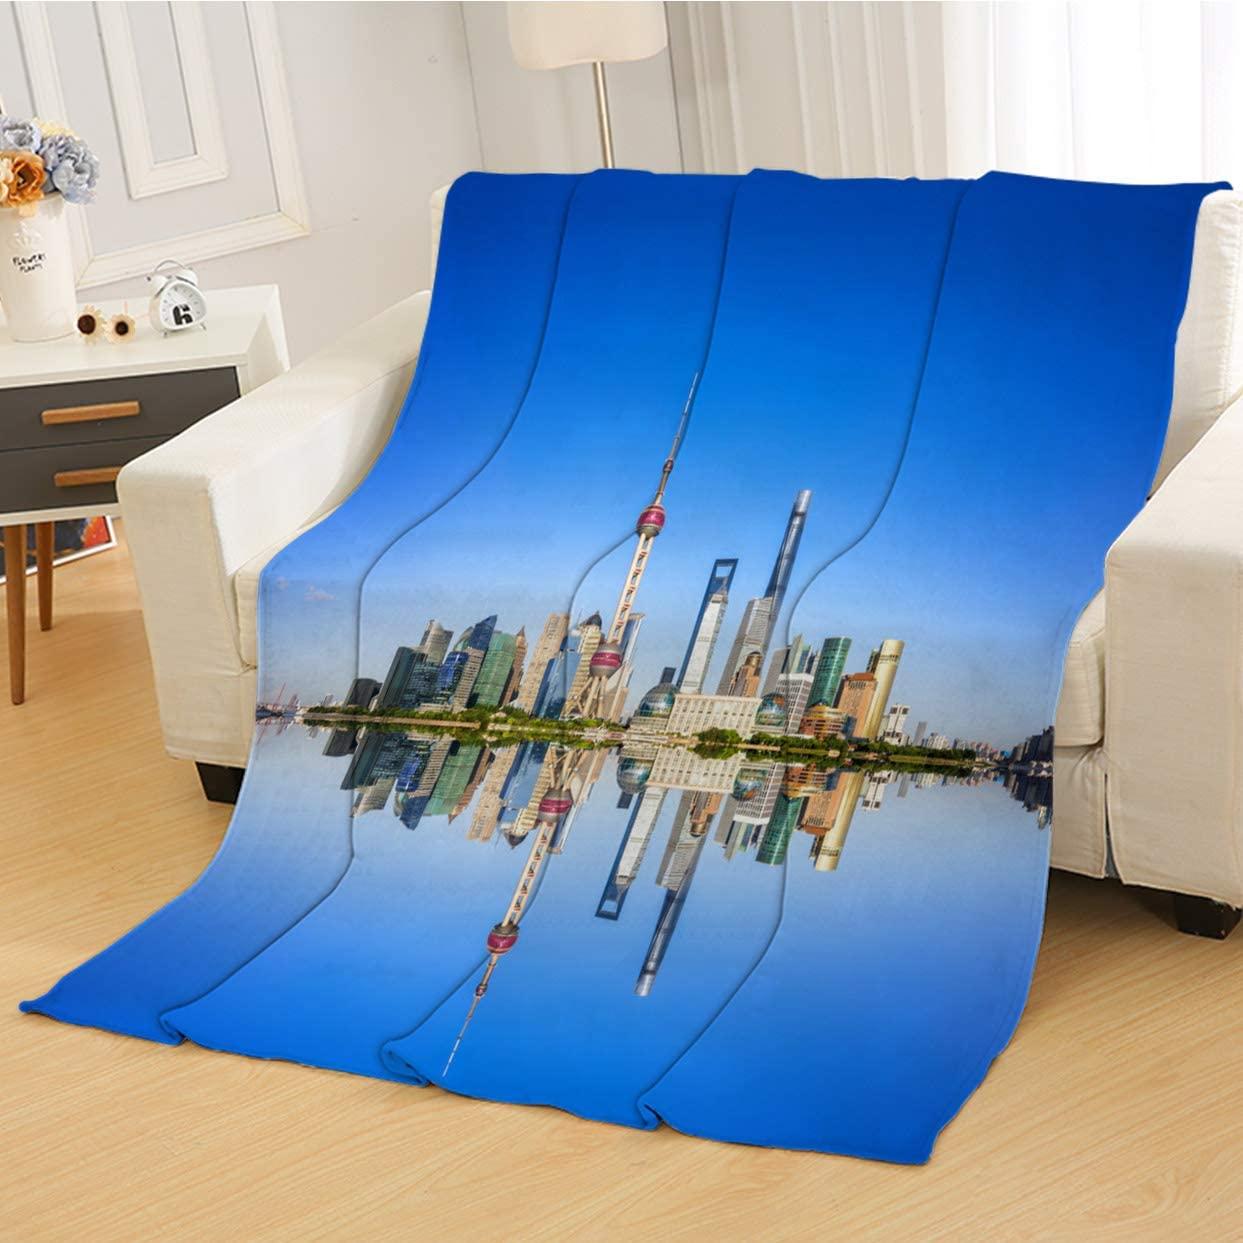 RLDSESS Landscape Soft Baby Blanket, All Season Blanket,Shanghai Landscape,Soft Weighted Blanket,Baby Size: 31Wx47L inch